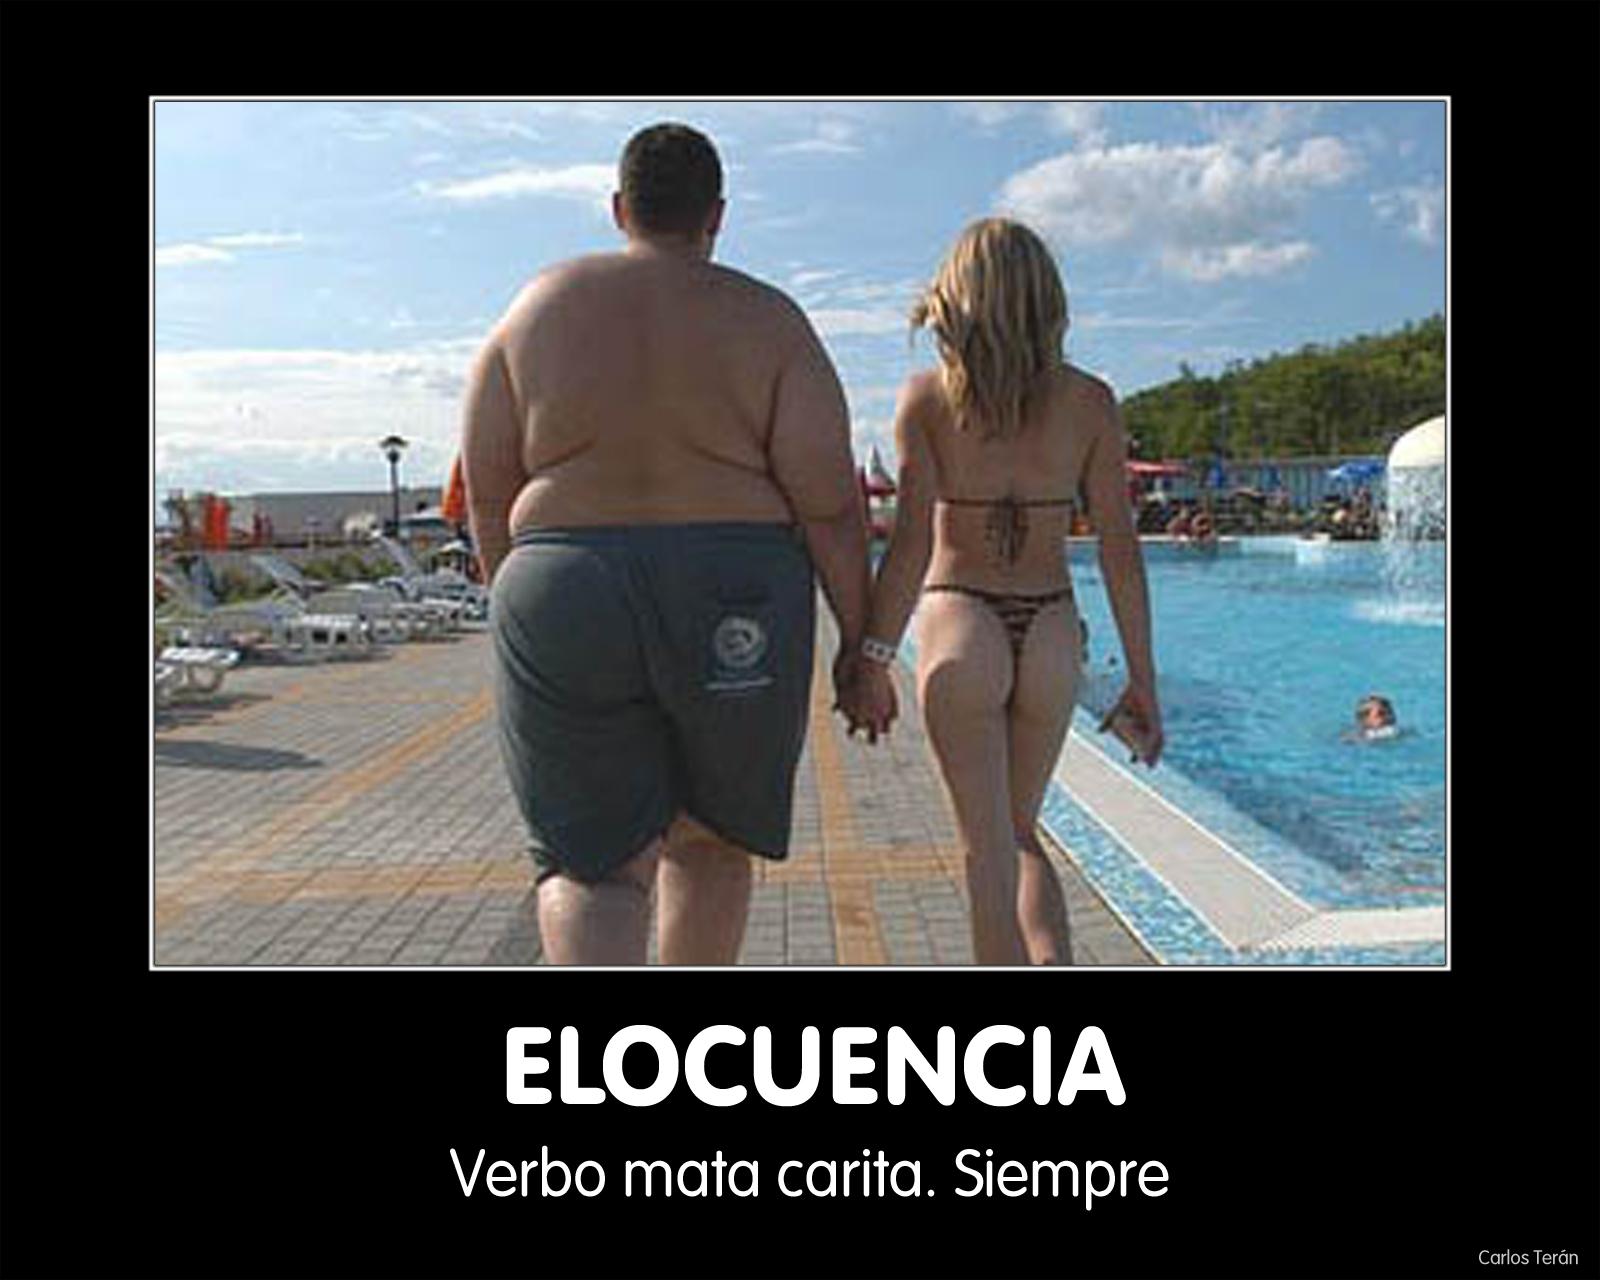 http://3.bp.blogspot.com/_iLsBG-TnMy4/SrxFq27tgyI/AAAAAAAAAN0/WHf0KlND19w/s1600/Elocuencia.jpg